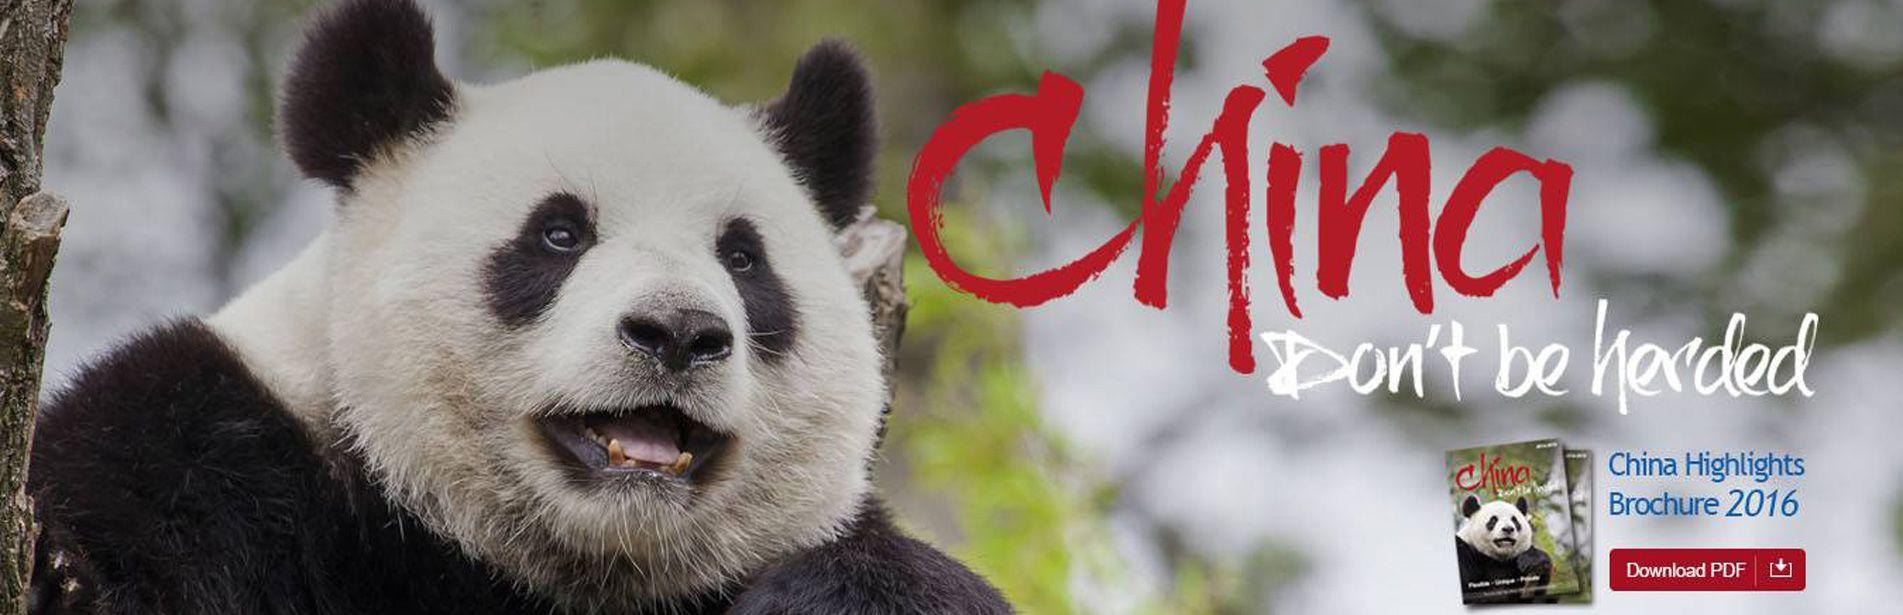 China Highlights Brochure 2016 Download